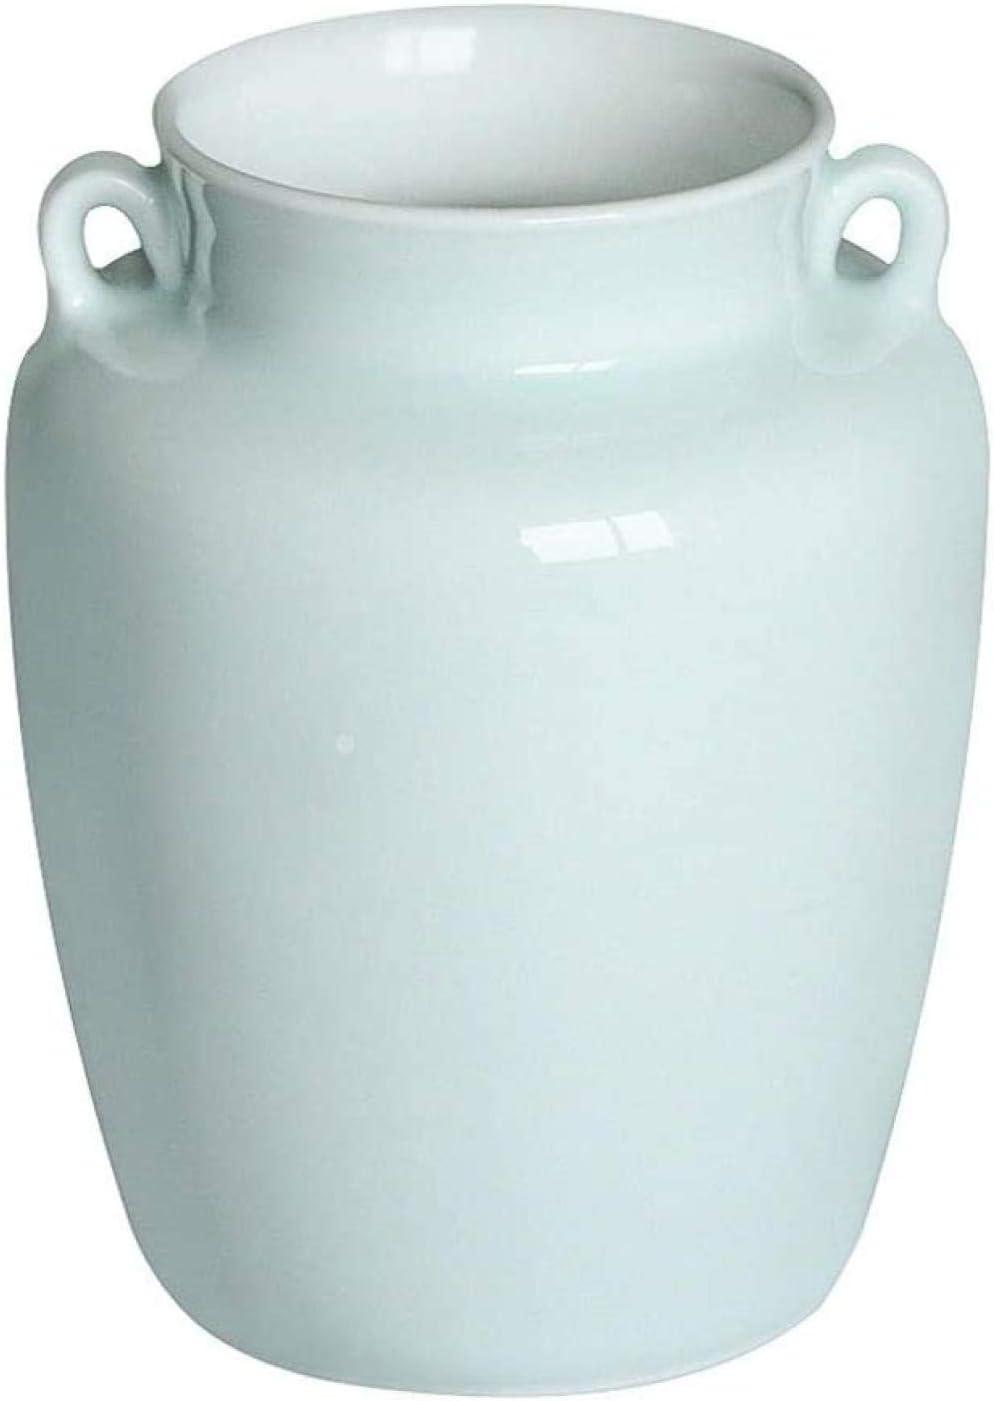 Statues Vases Binaural Ceramic Max 86% OFF Vase R Living Home Ranking TOP6 Elegant Office